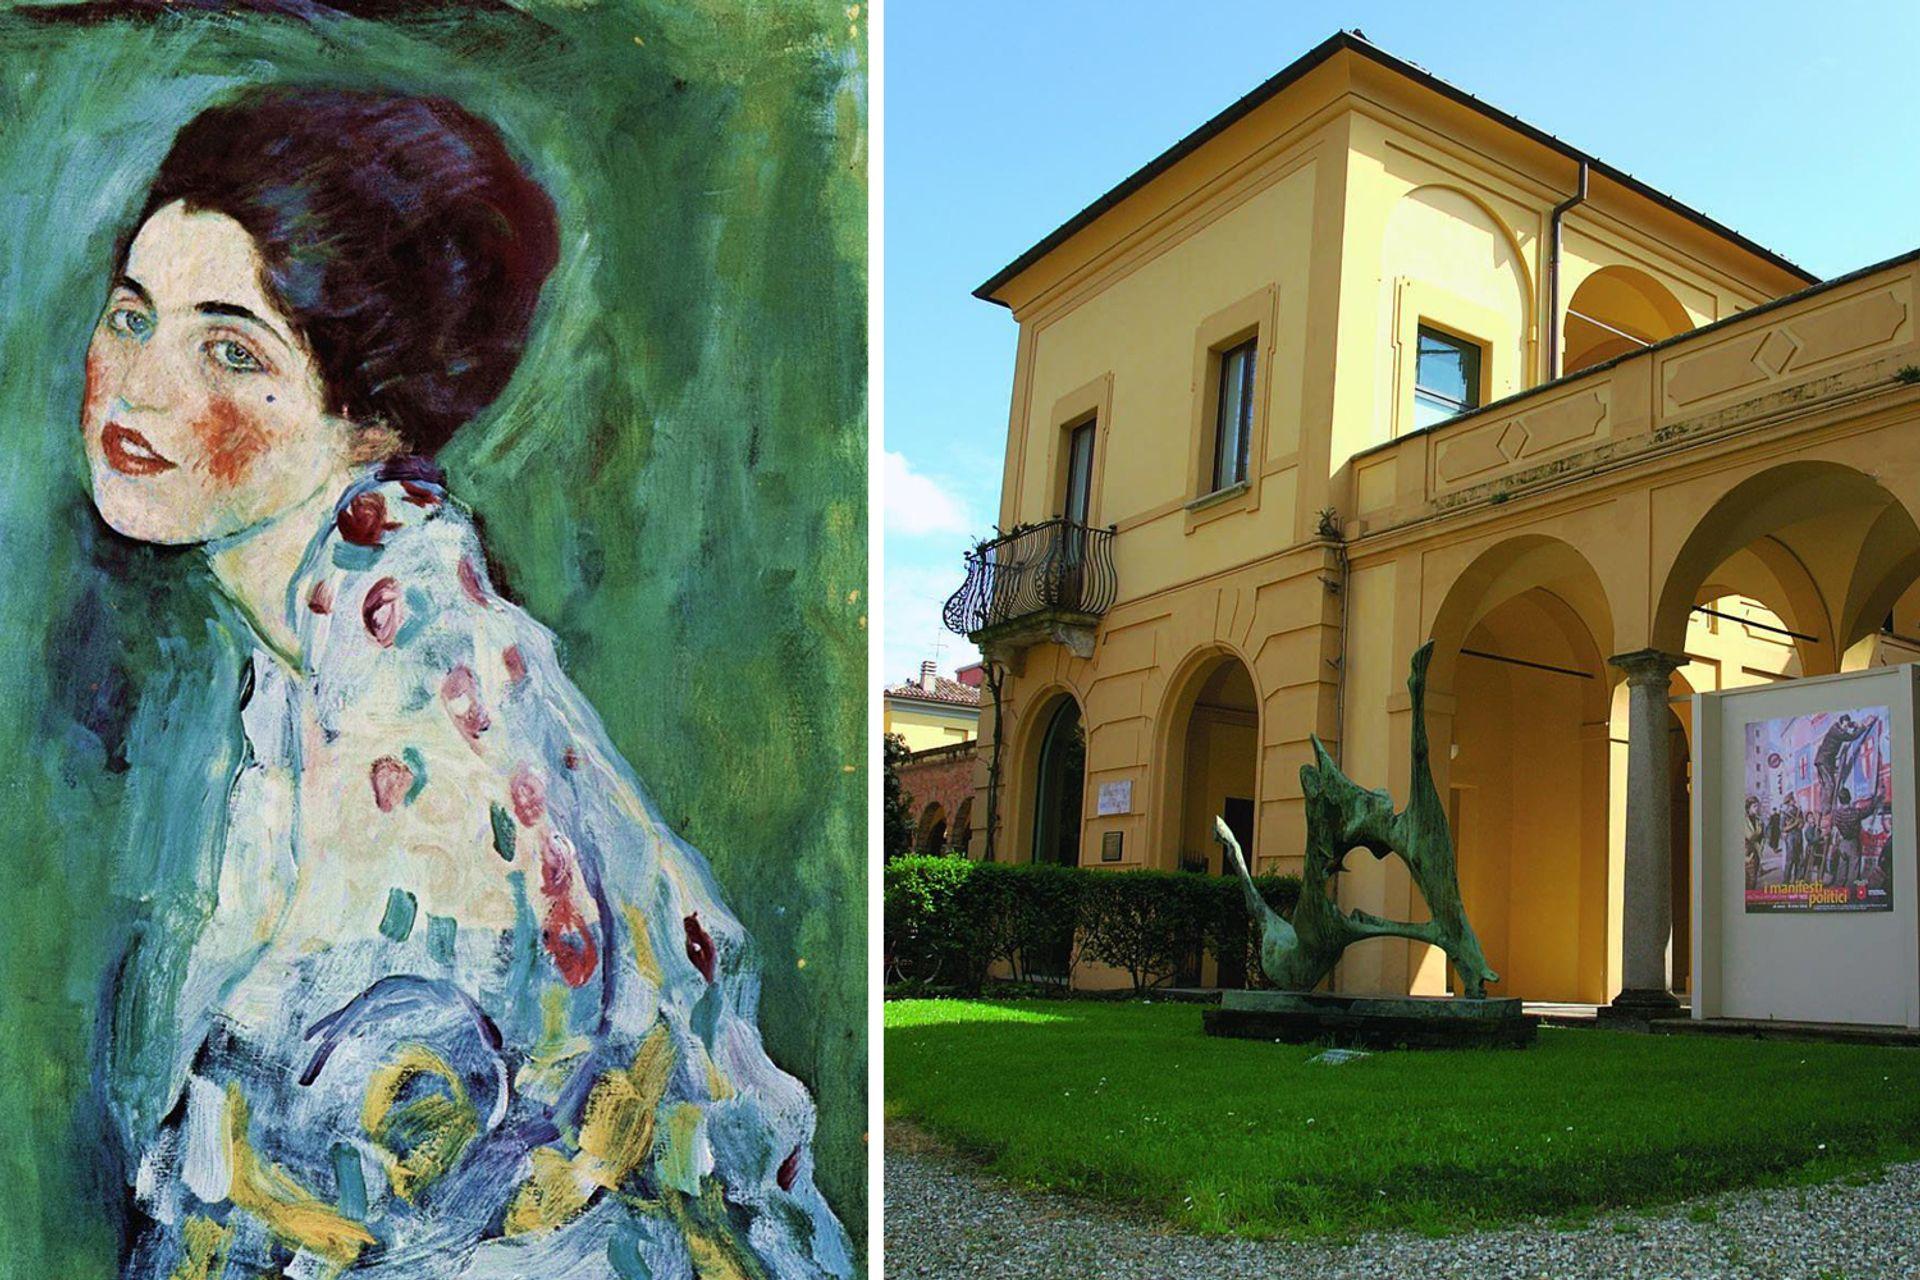 Left, Klimt's Portrait of a Lady (1916-17); and right, the Ricci Oddi gallery in Piacenza Photos: © Ricci Oddi gallery/Facebook